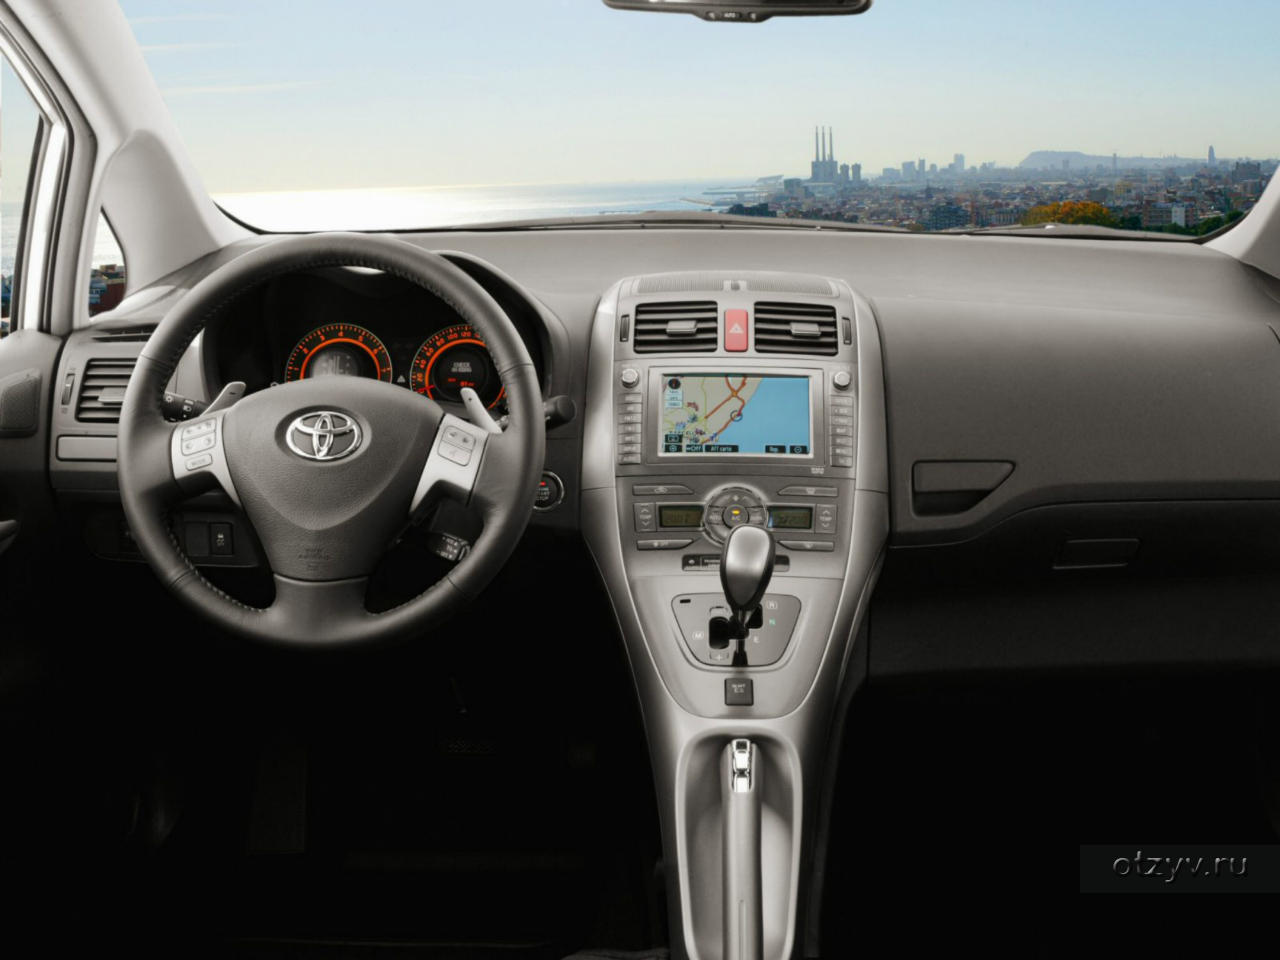 Toyota Аурис 2008 робот техническая характеристика #3